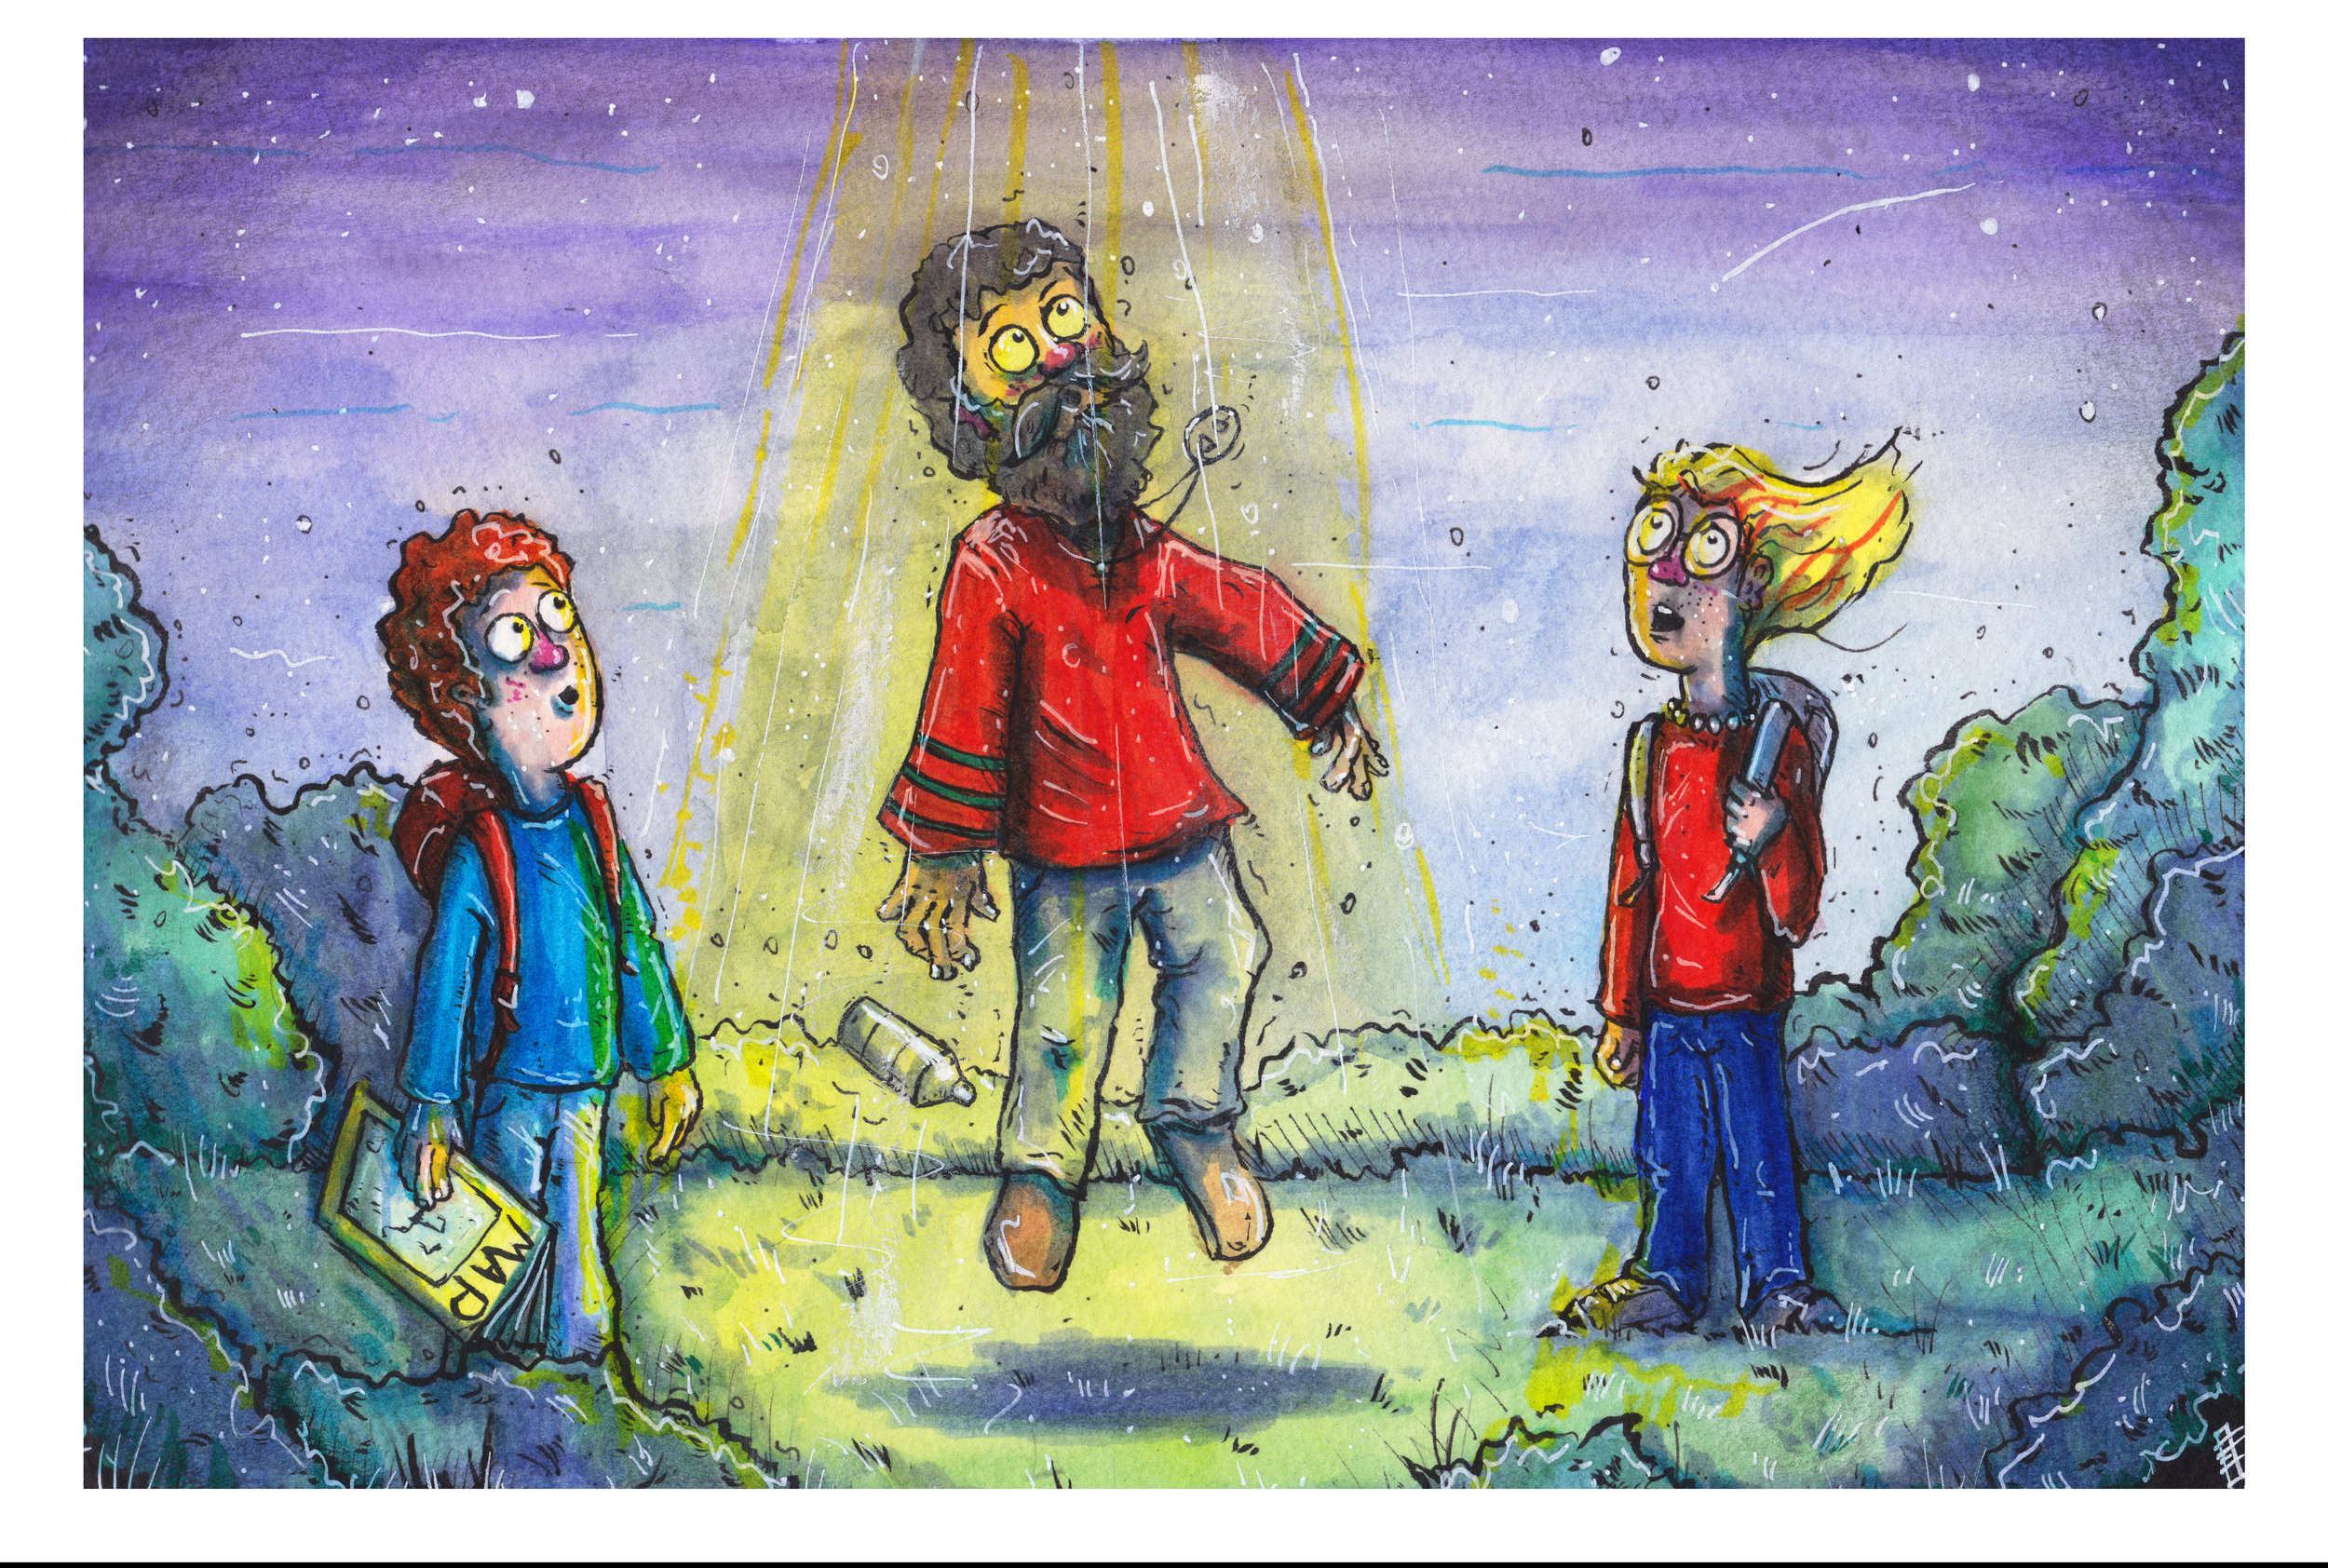 postcard_mystery_page_006.jpg